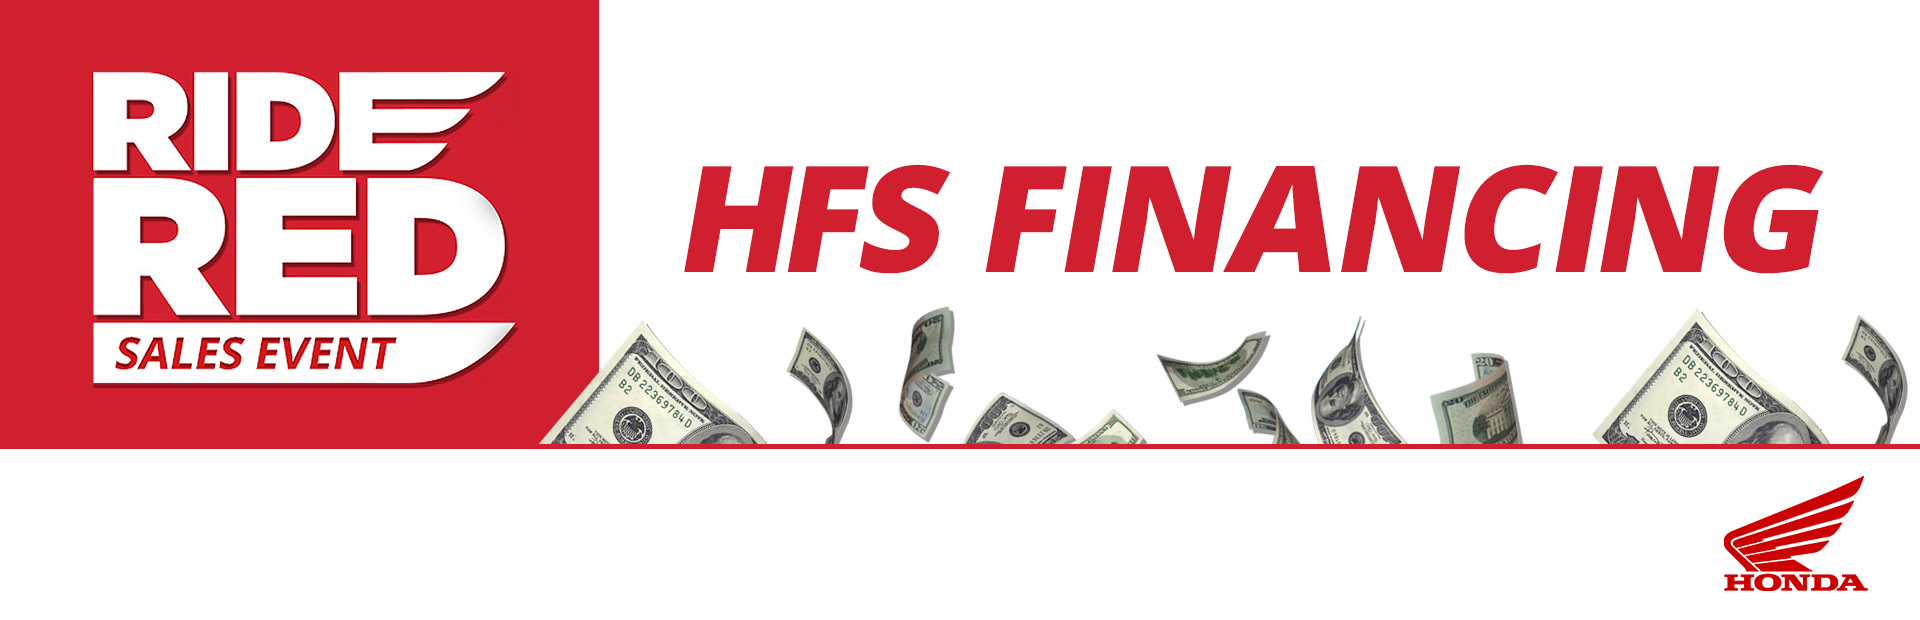 Honda Ride Red Sales Event Hfs Financing Interstate Honda Fort